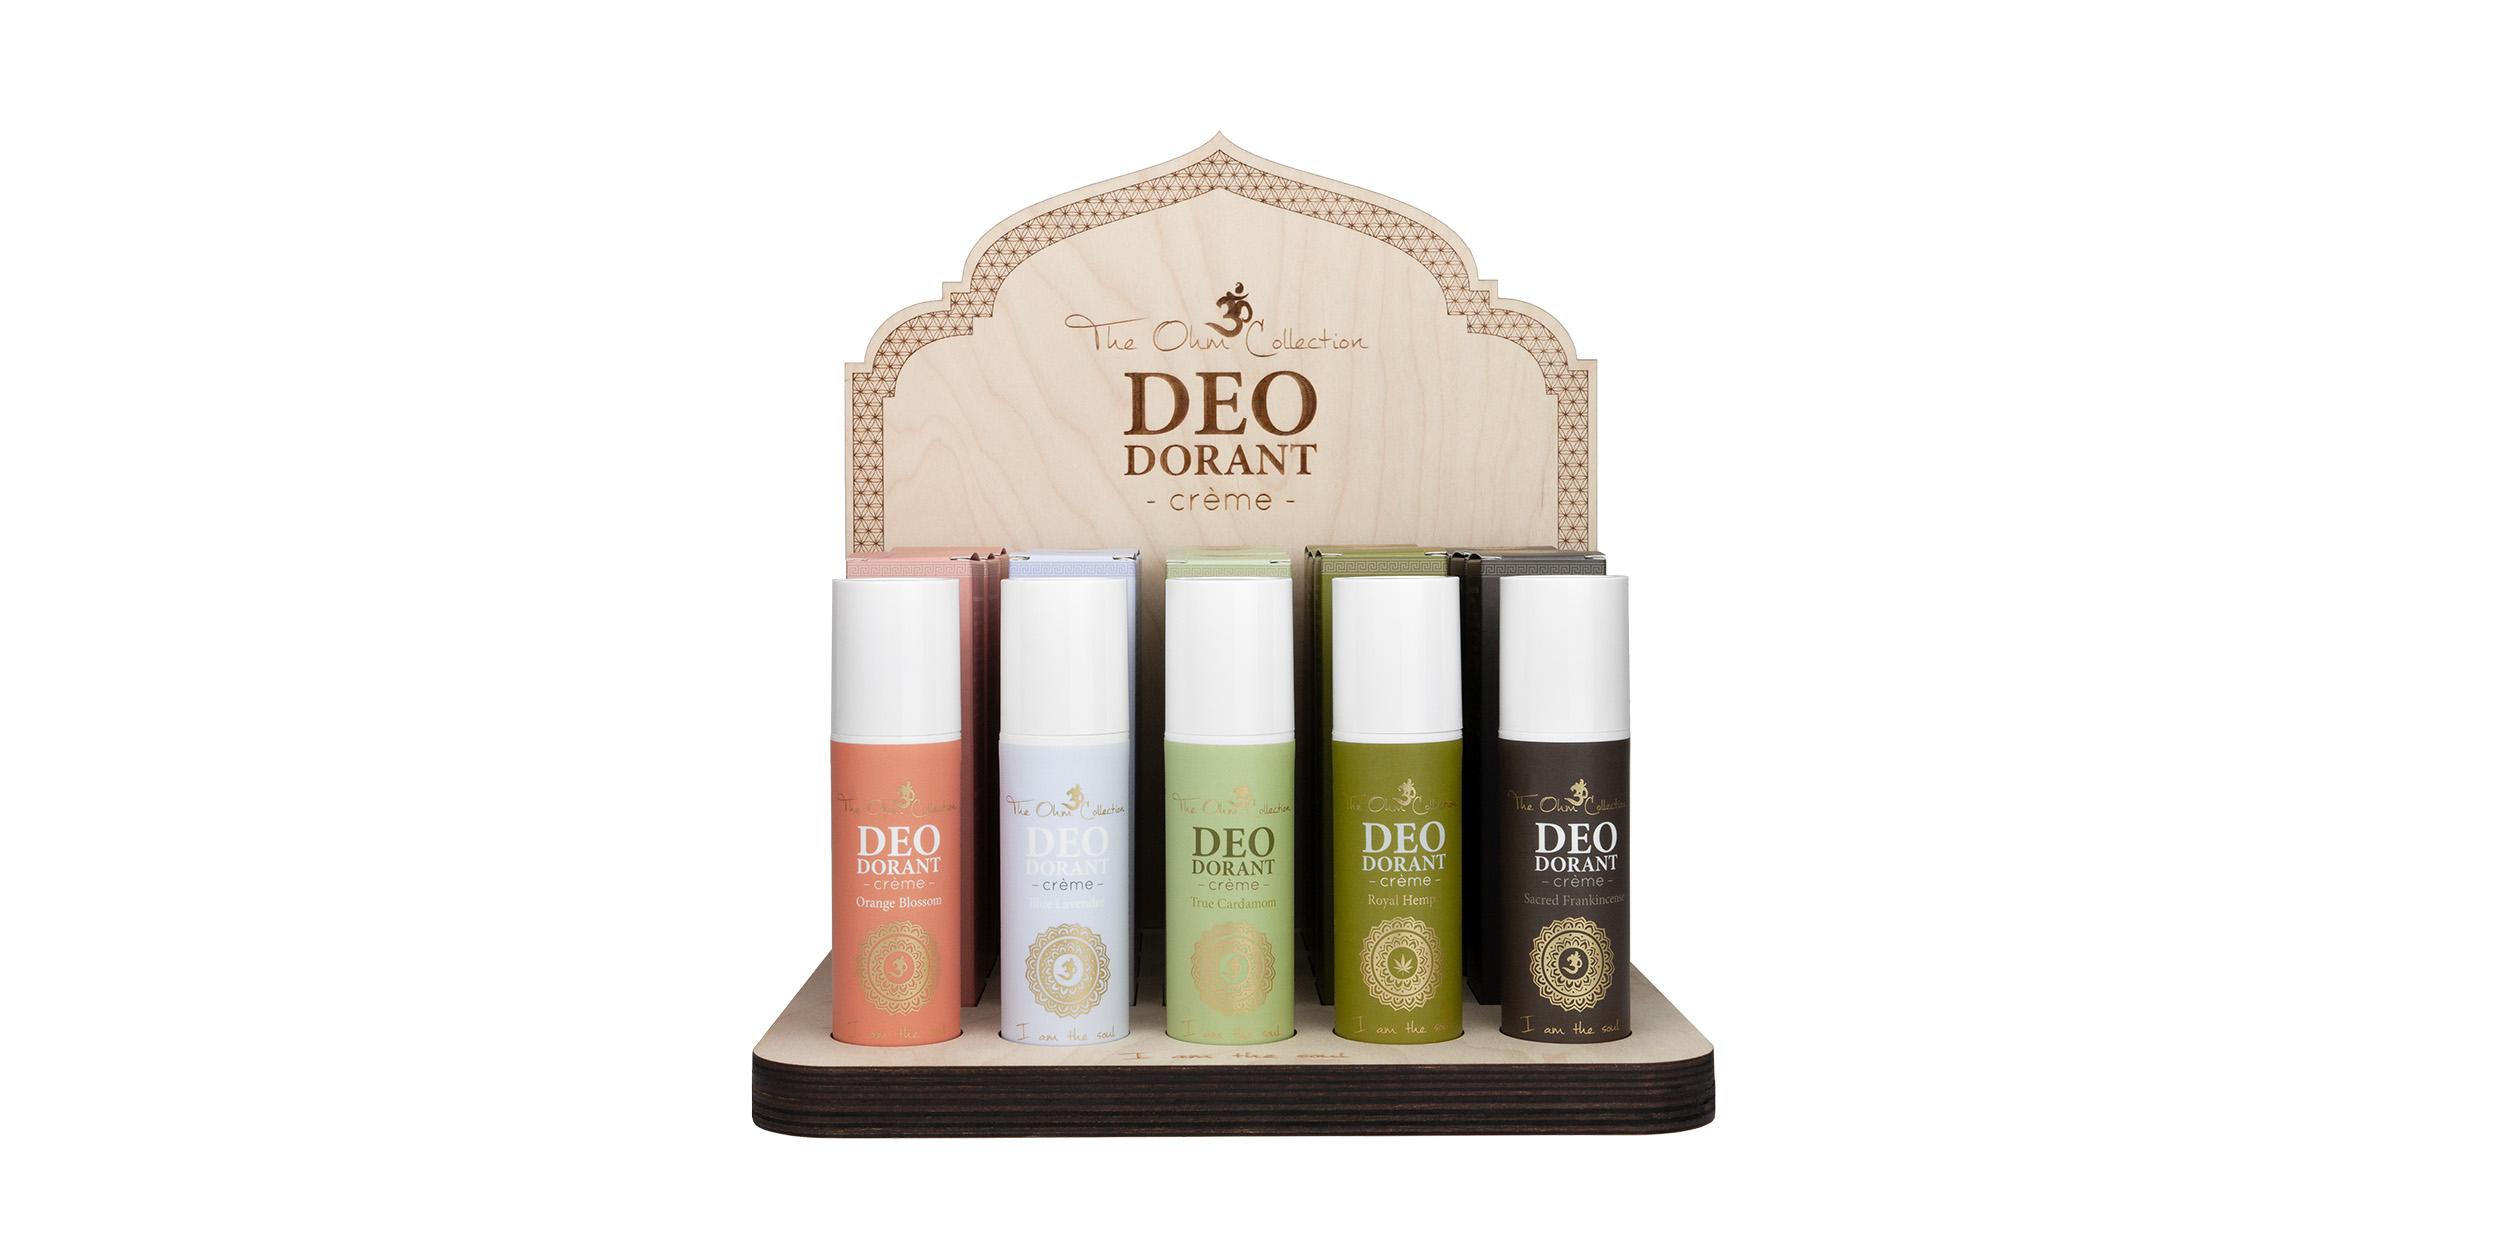 deodorant creme display